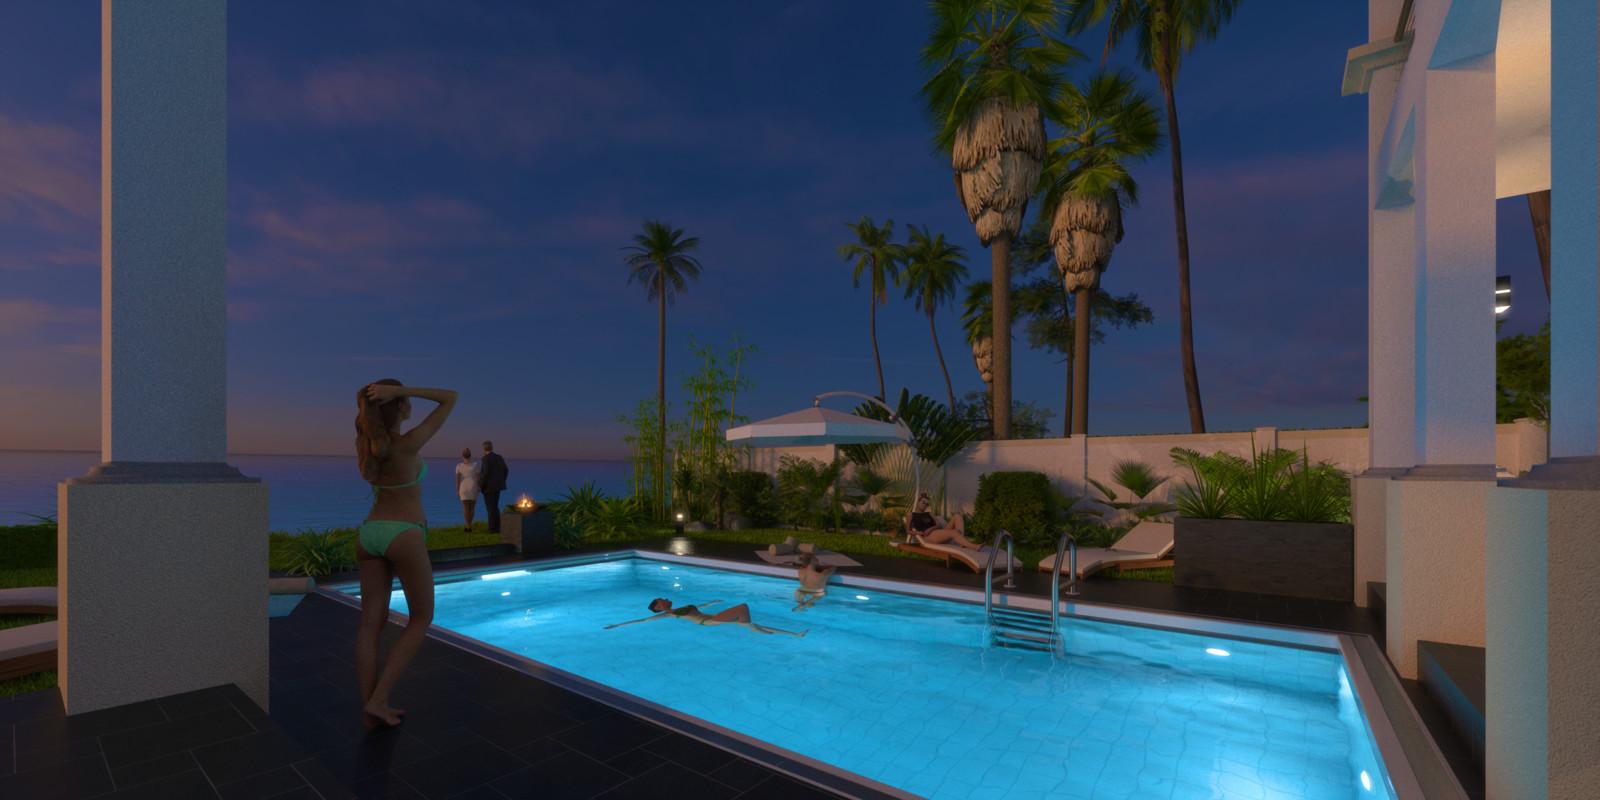 SketchUp + Thea Render  Seagrove Beach House: Poolside 6C Night B Glare Samantha 2160 × 1080 Presto MC Bucket